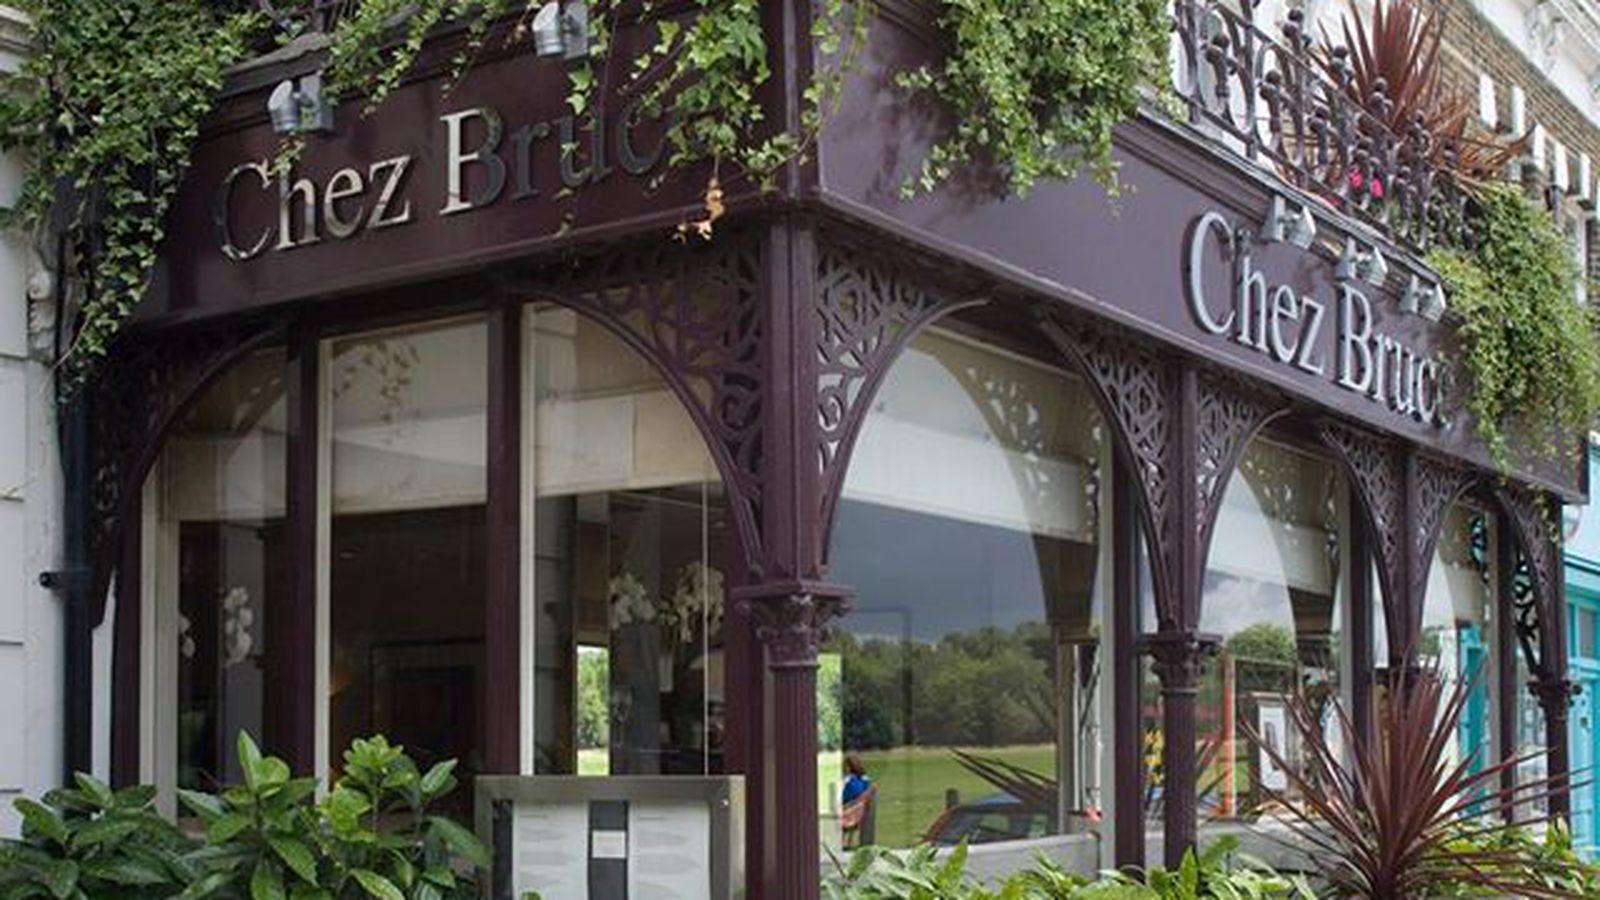 uk 39 s michelin starred restaurants face hygiene scrutiny. Black Bedroom Furniture Sets. Home Design Ideas